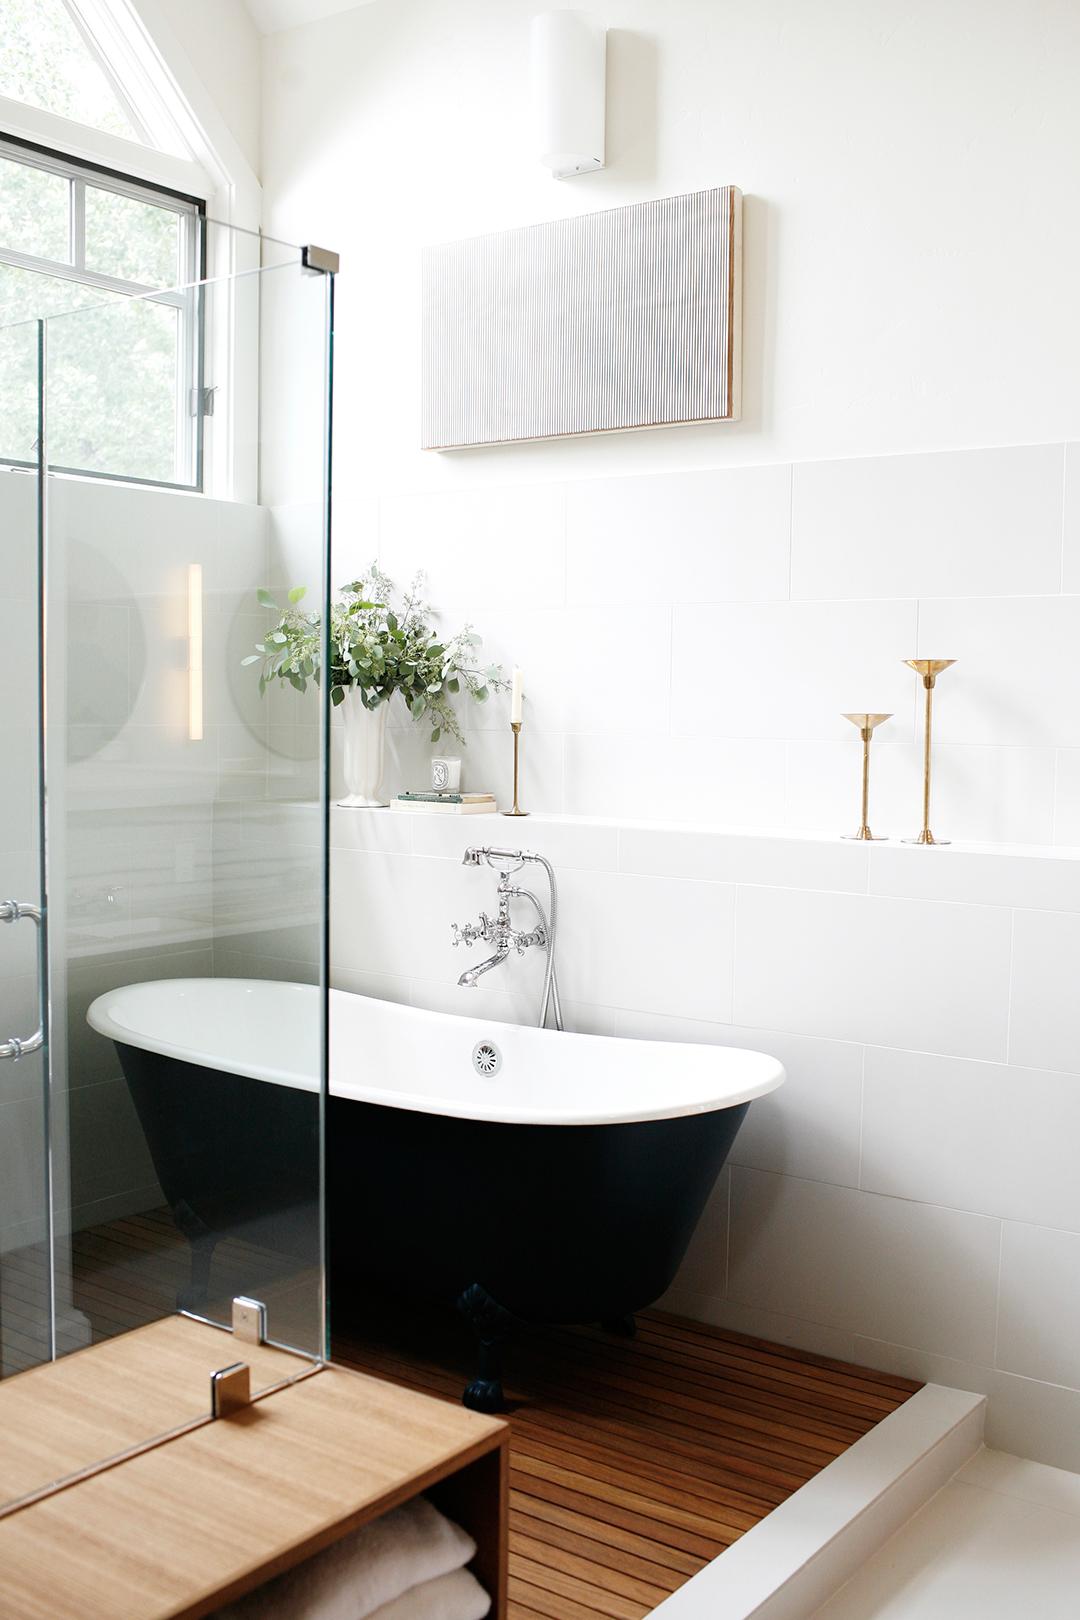 05-JGID-Sun-Valley-Bathroom-Remodel.JPG